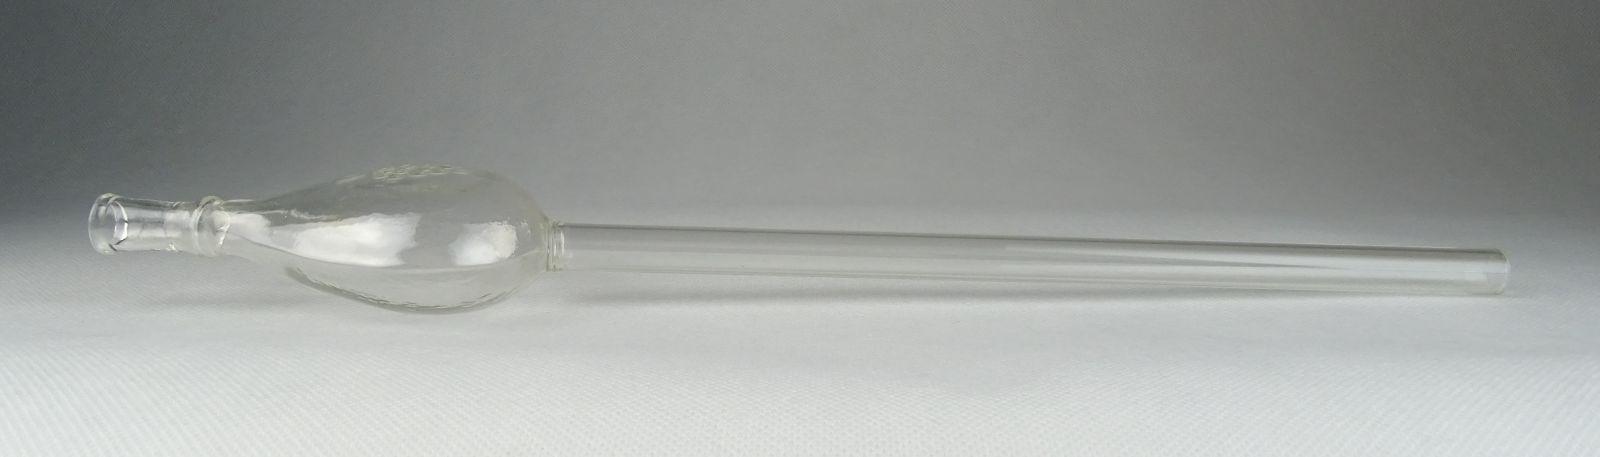 DSC00920.JPG (1600×457)